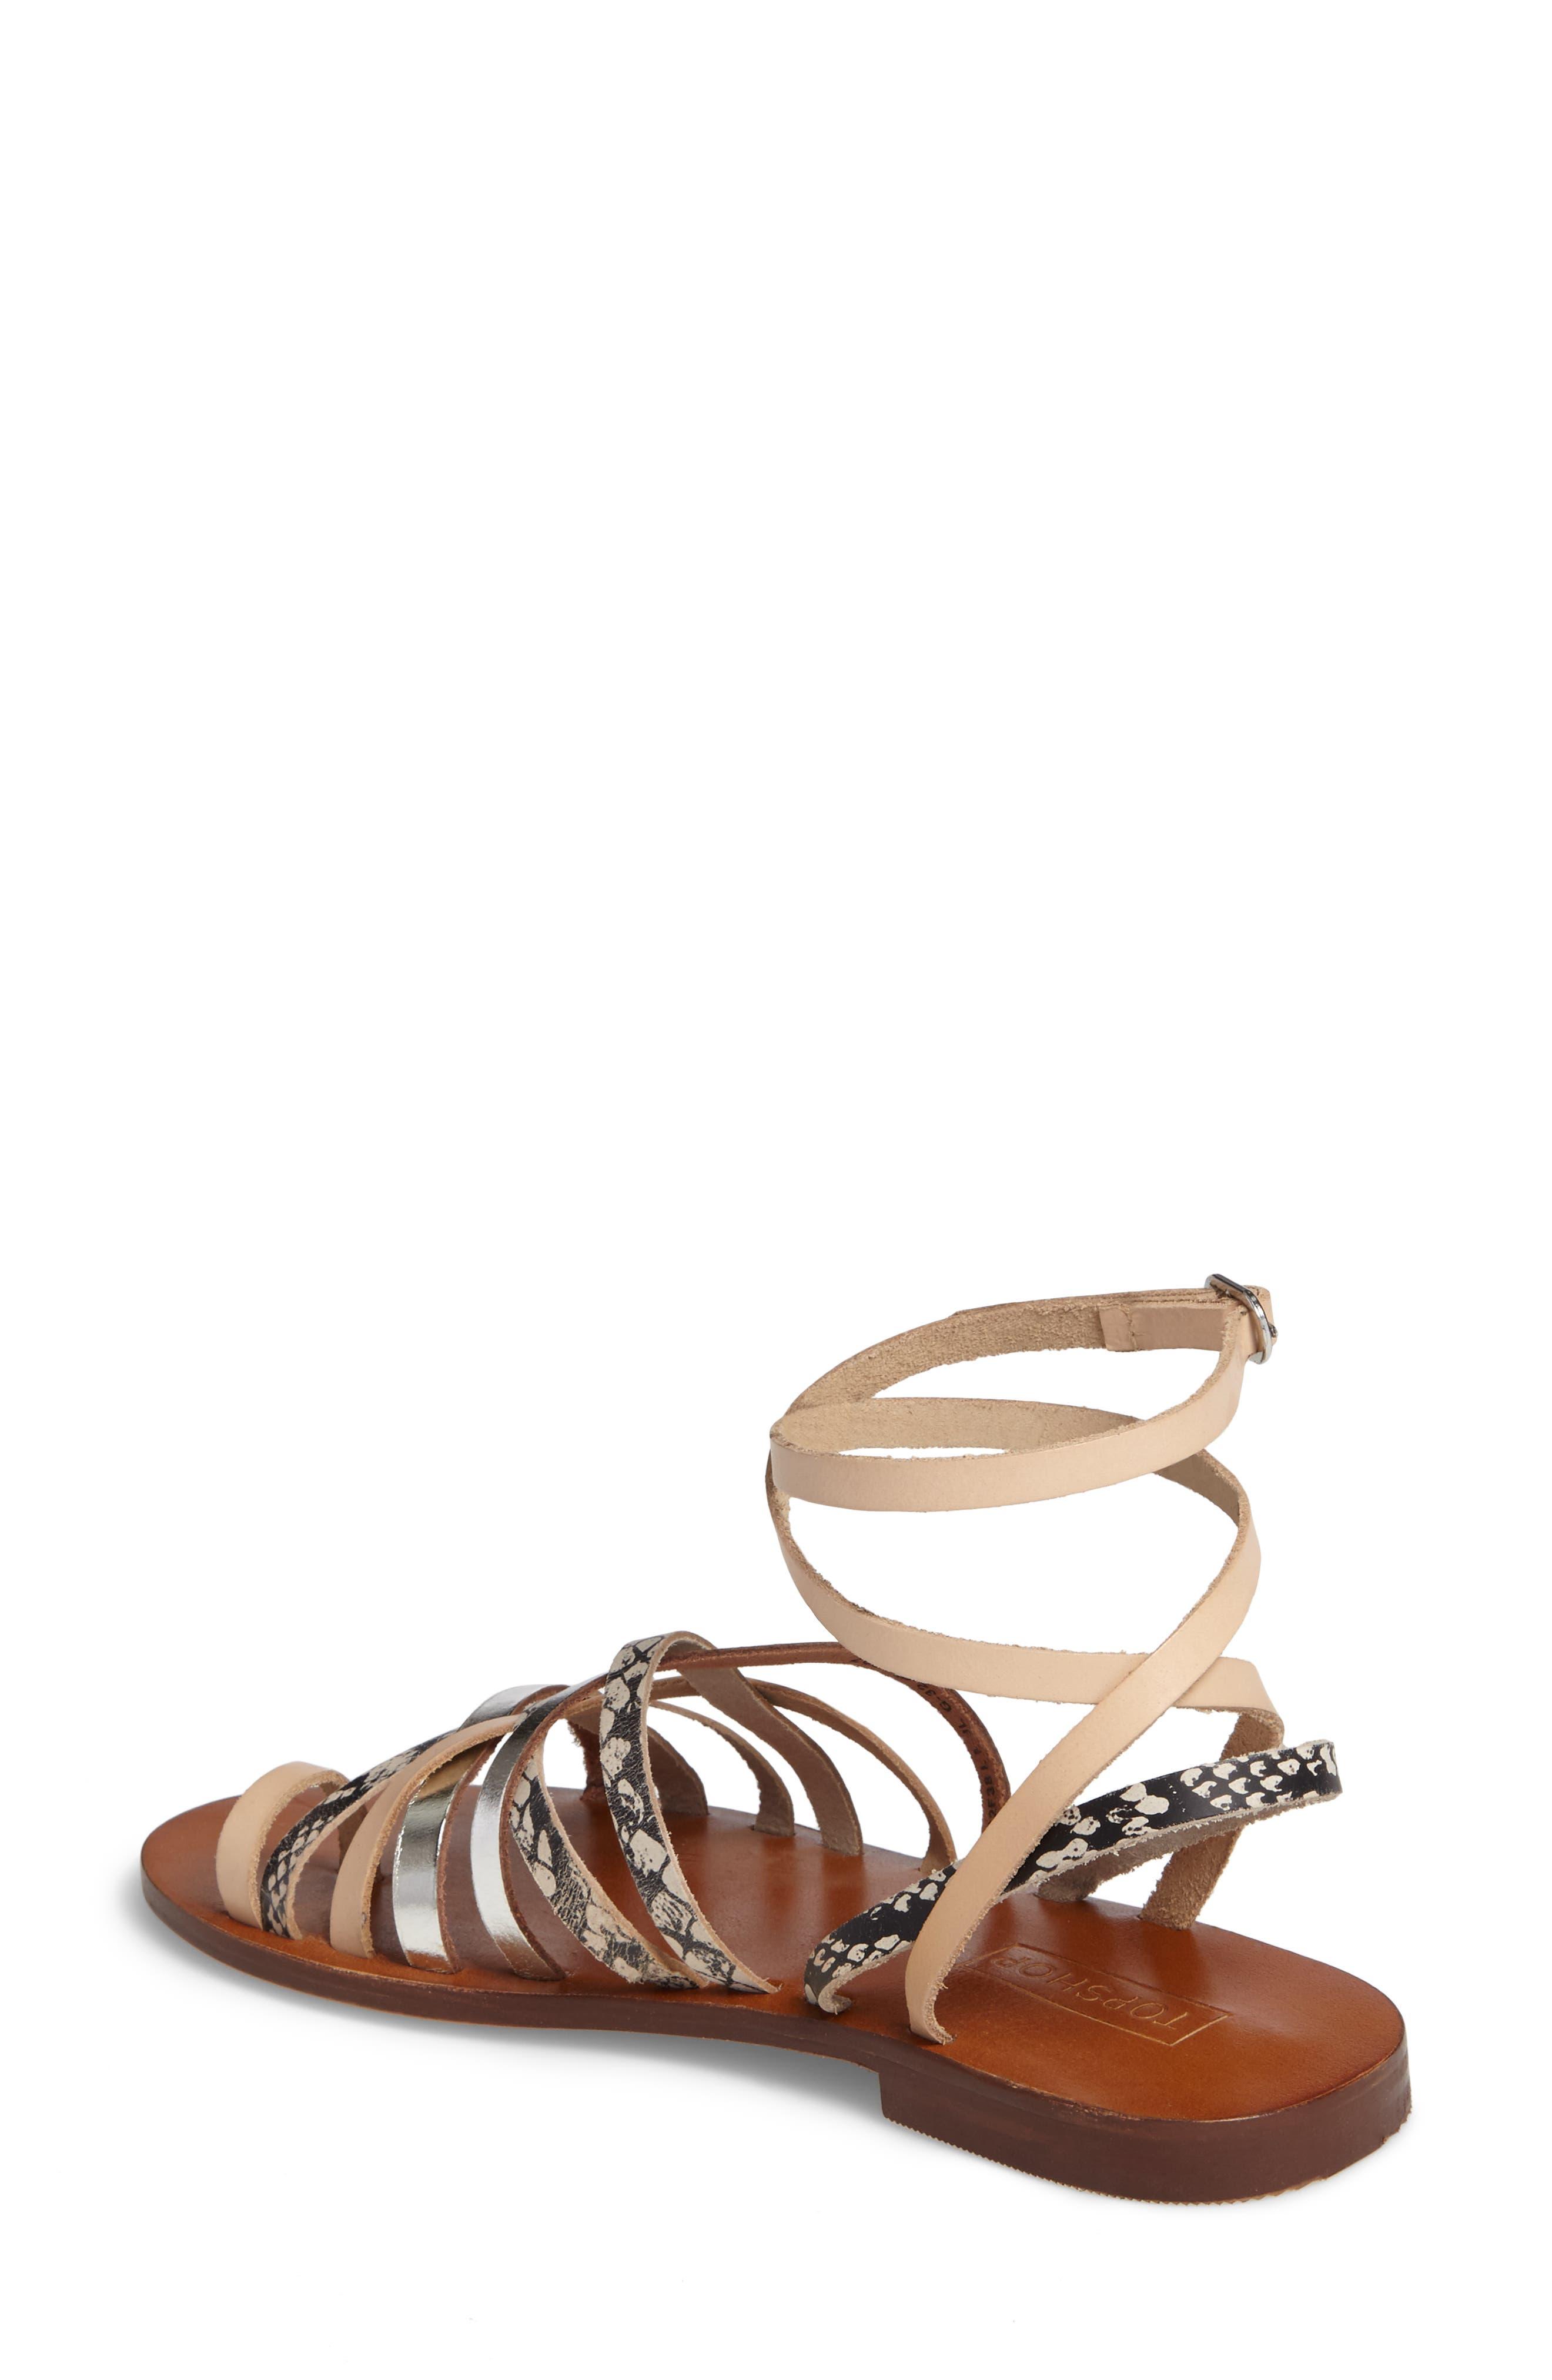 Fizzy Strappy Sandal,                             Alternate thumbnail 2, color,                             001